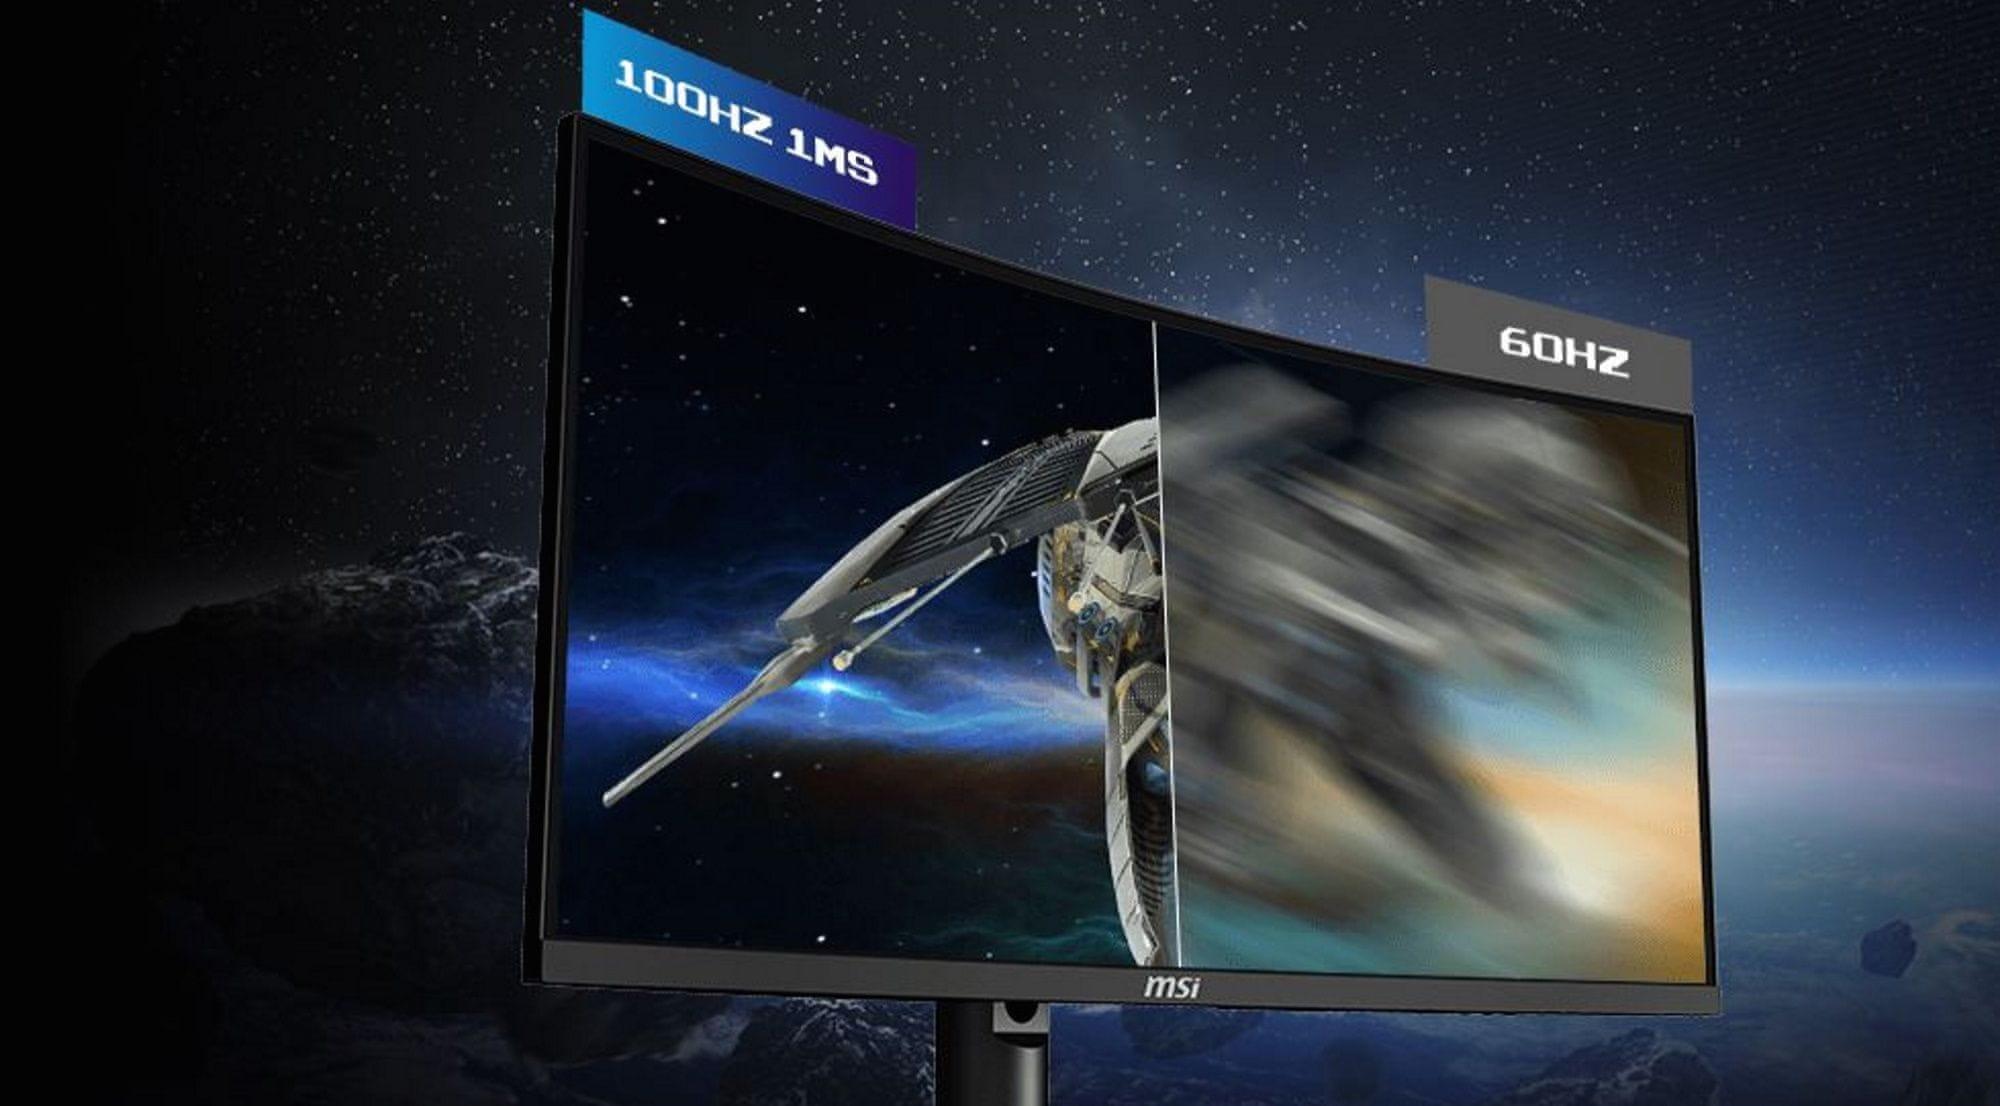 monitor gamingowy MSI Optix MAG272CQR (Optix MAG272CQR) płynny obraz 1 ms 165 Hz